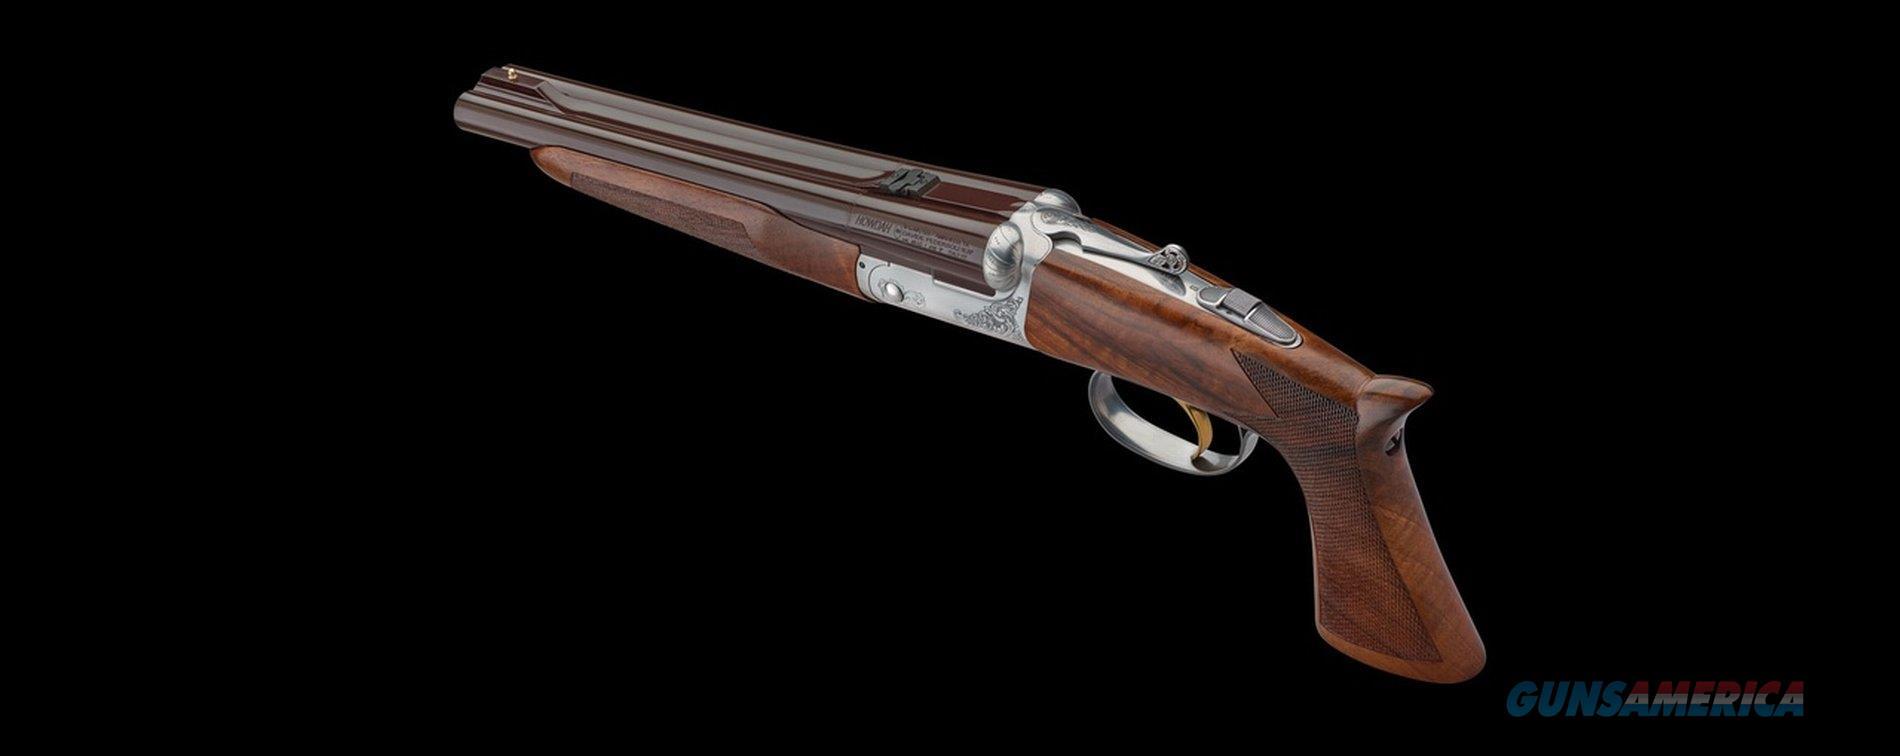 Pedersoli Howdah Deluxe (Not Normally Sold in US)  Guns > Shotguns > Ithaca Shotguns > SxS